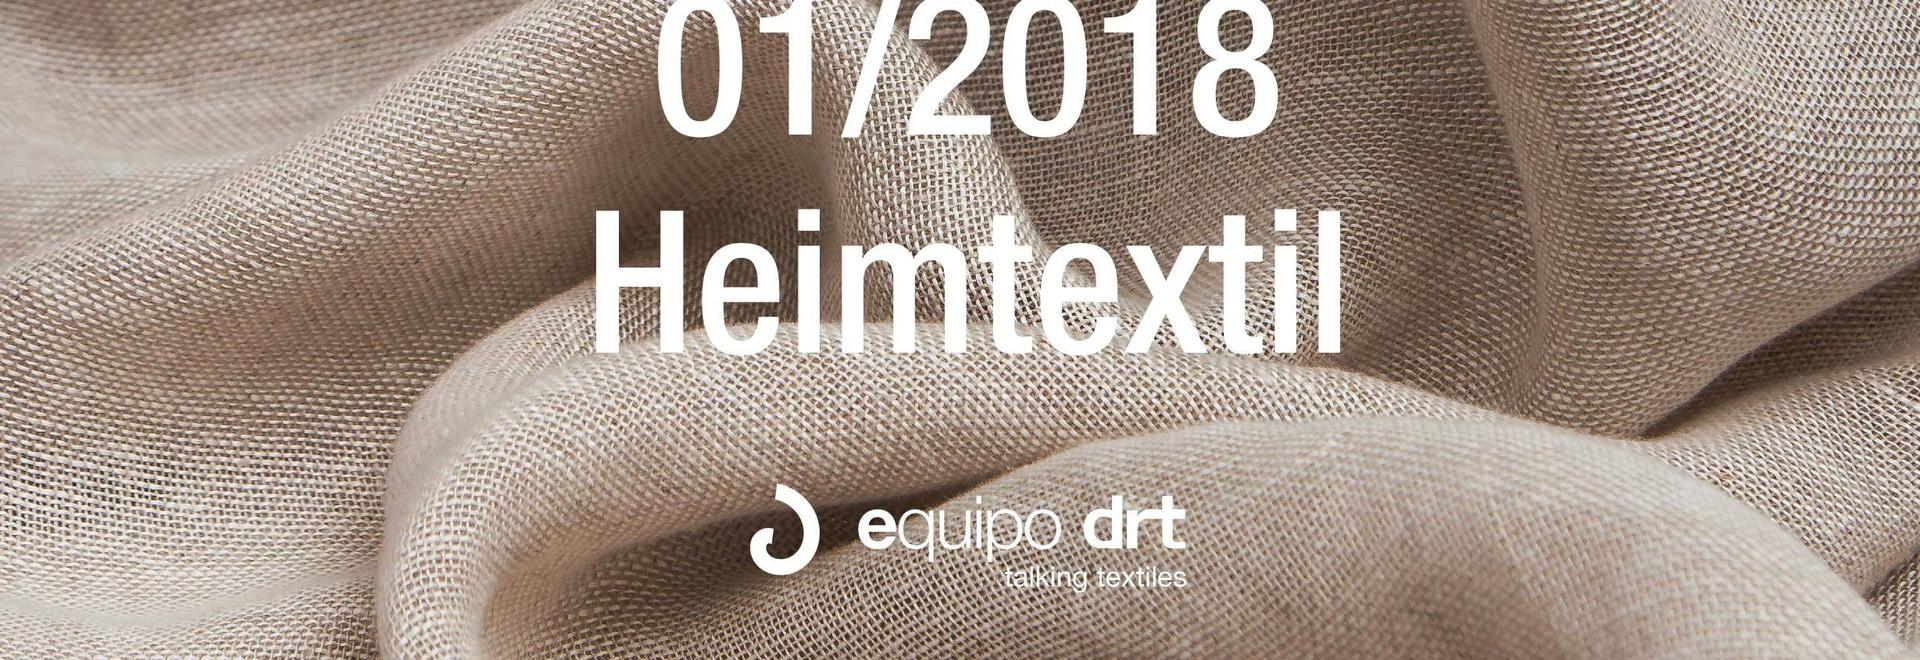 Heimtextil 2018, próxima feria internacional de Equipo DRT